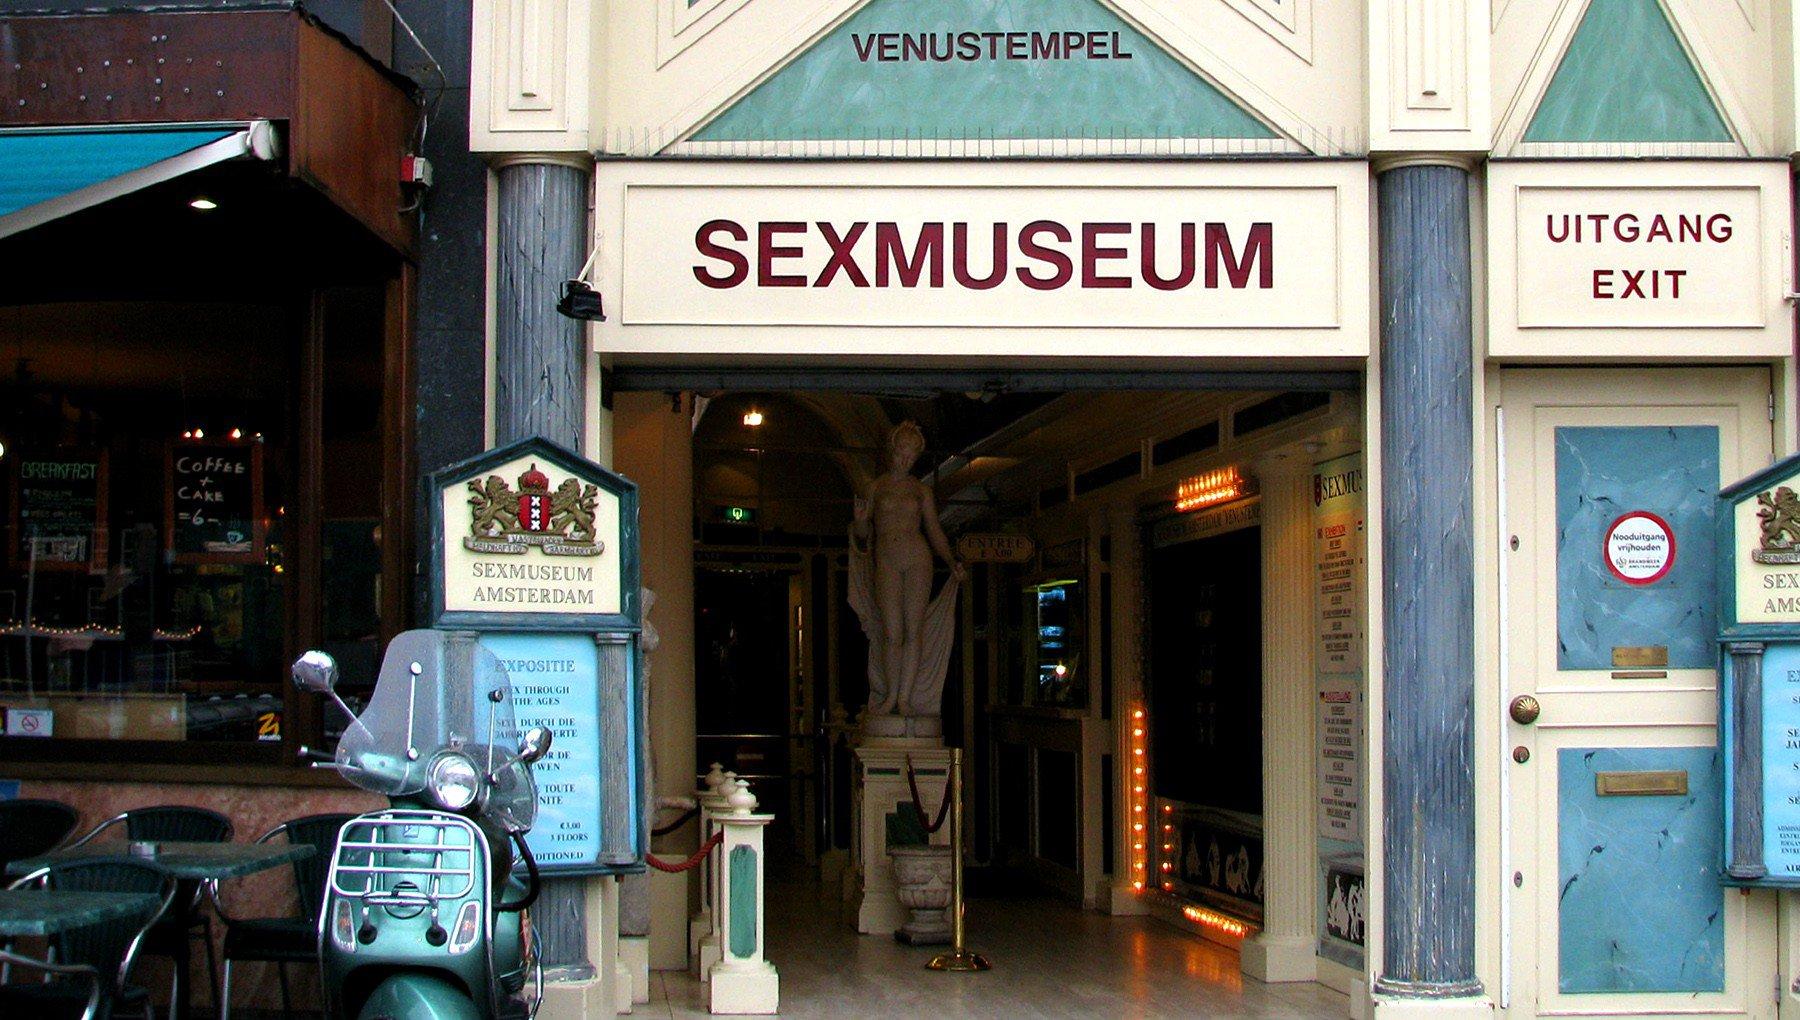 museum of sex amsterdam reviews in Newark